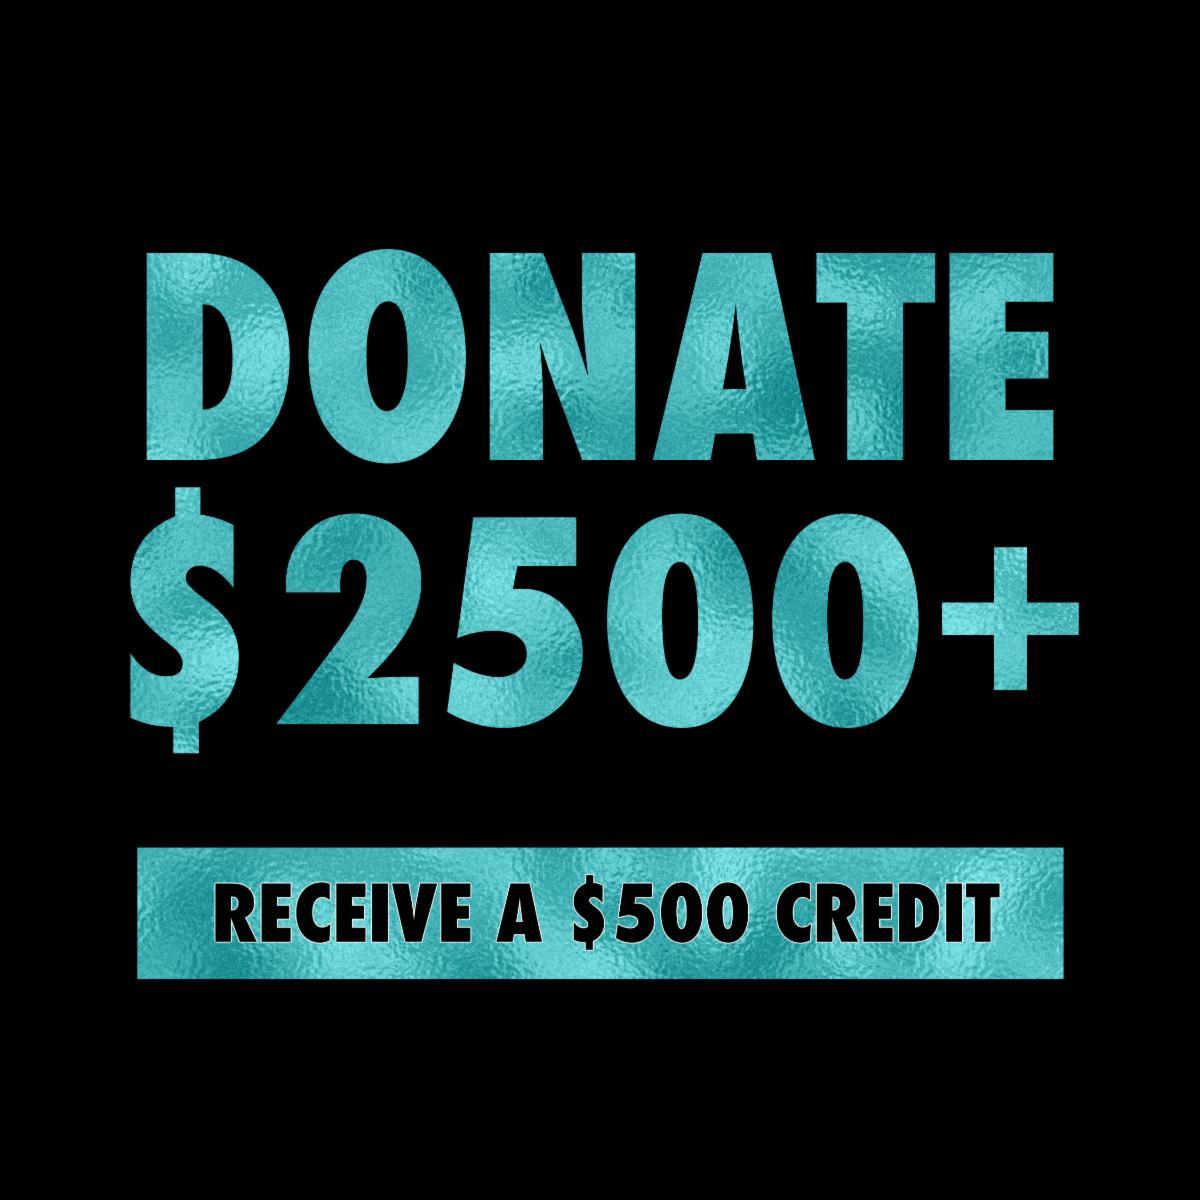 Donate $2500 Receive $500